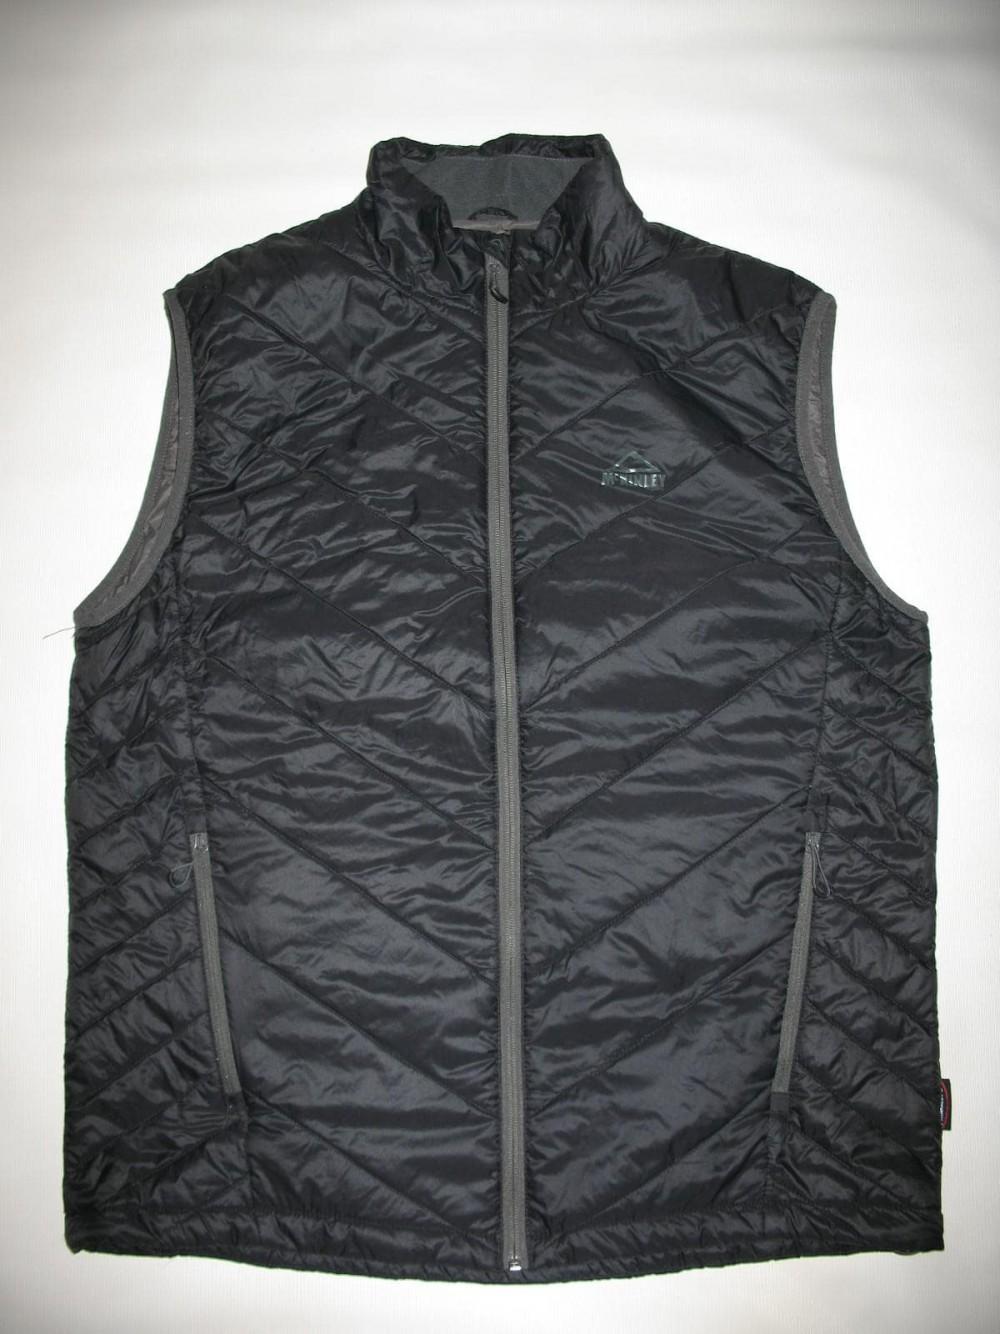 Жилет McKINLEY bellville  primaloft vest (размер XL) - 1